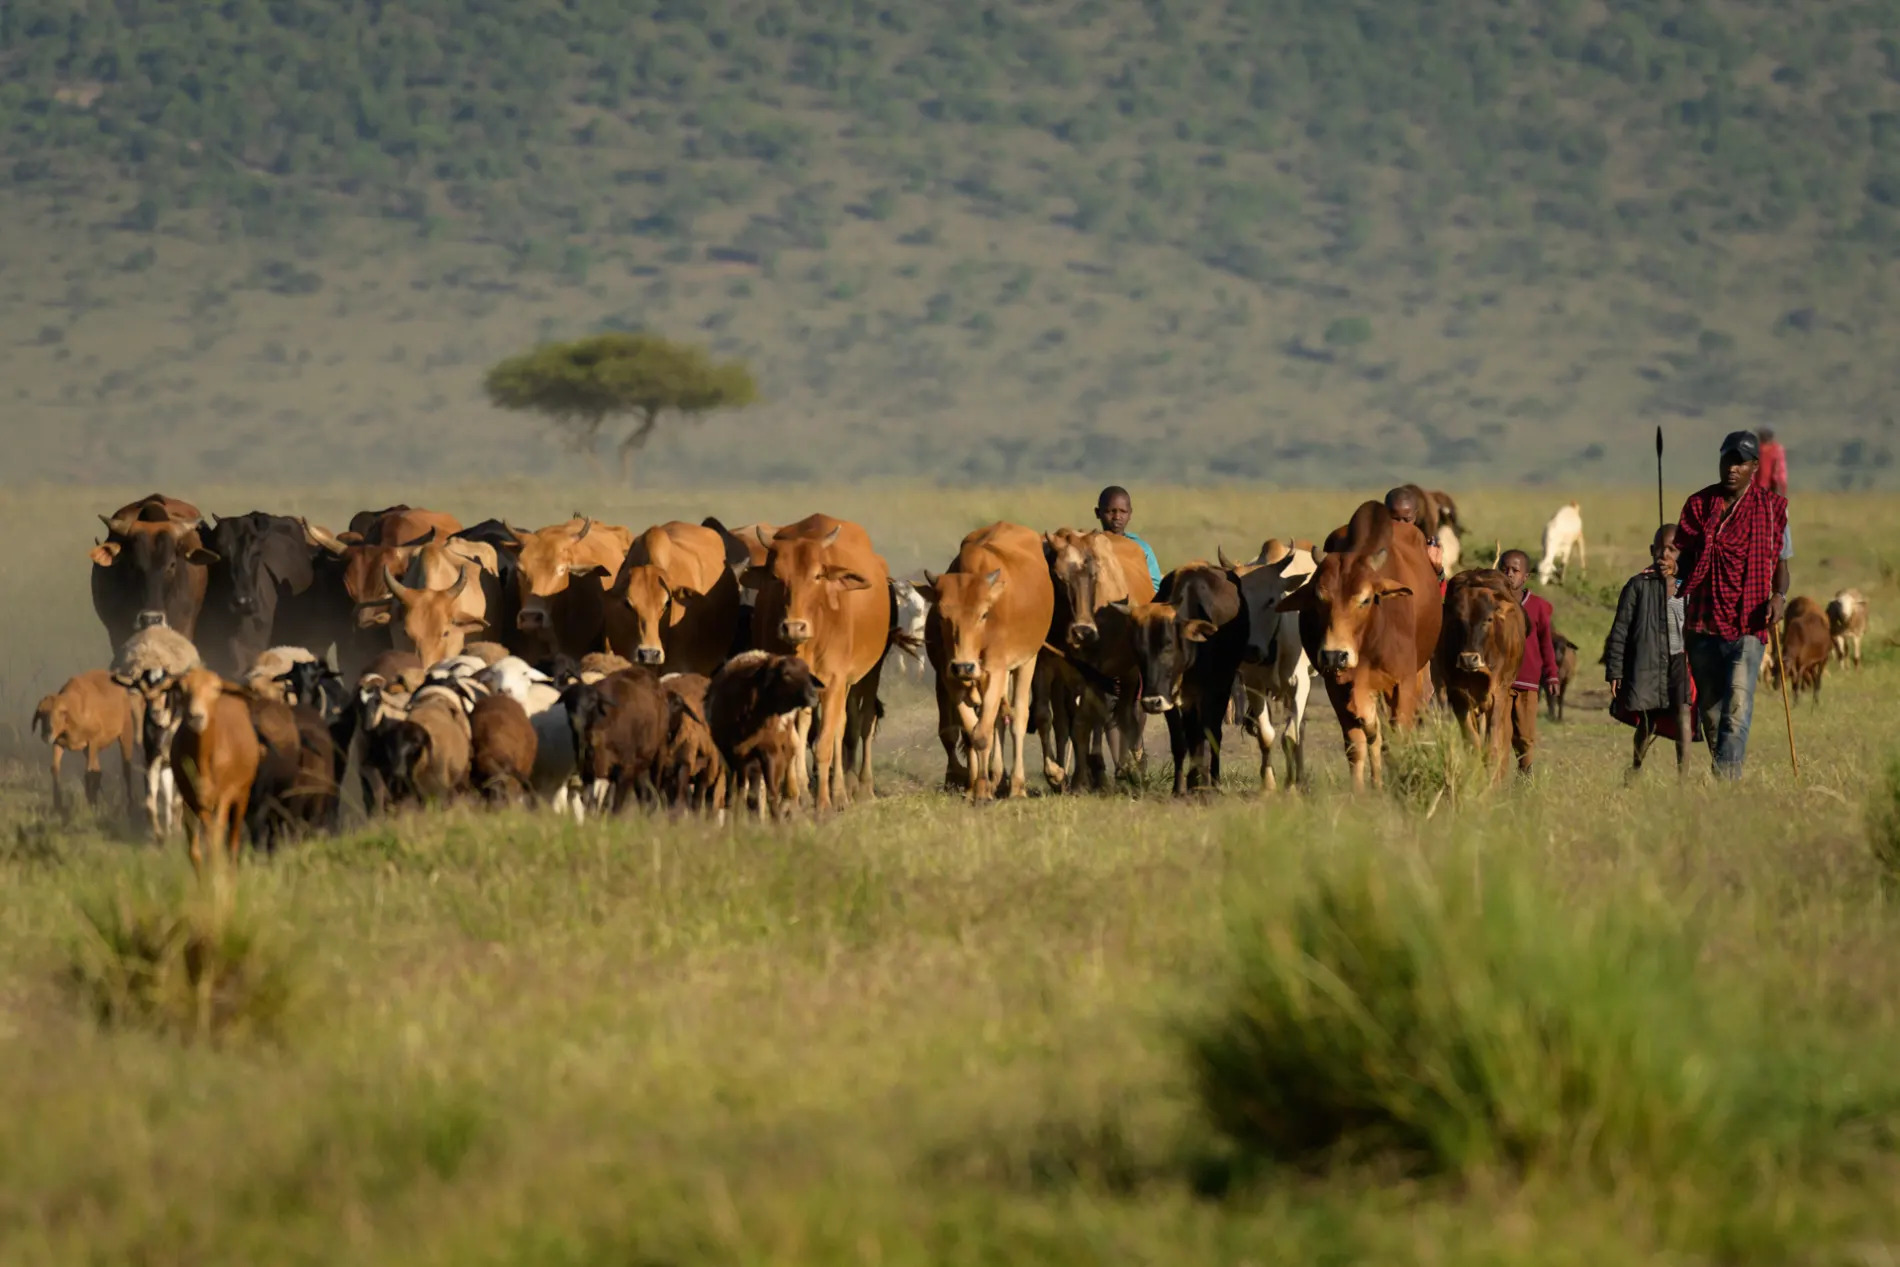 Maasai cows